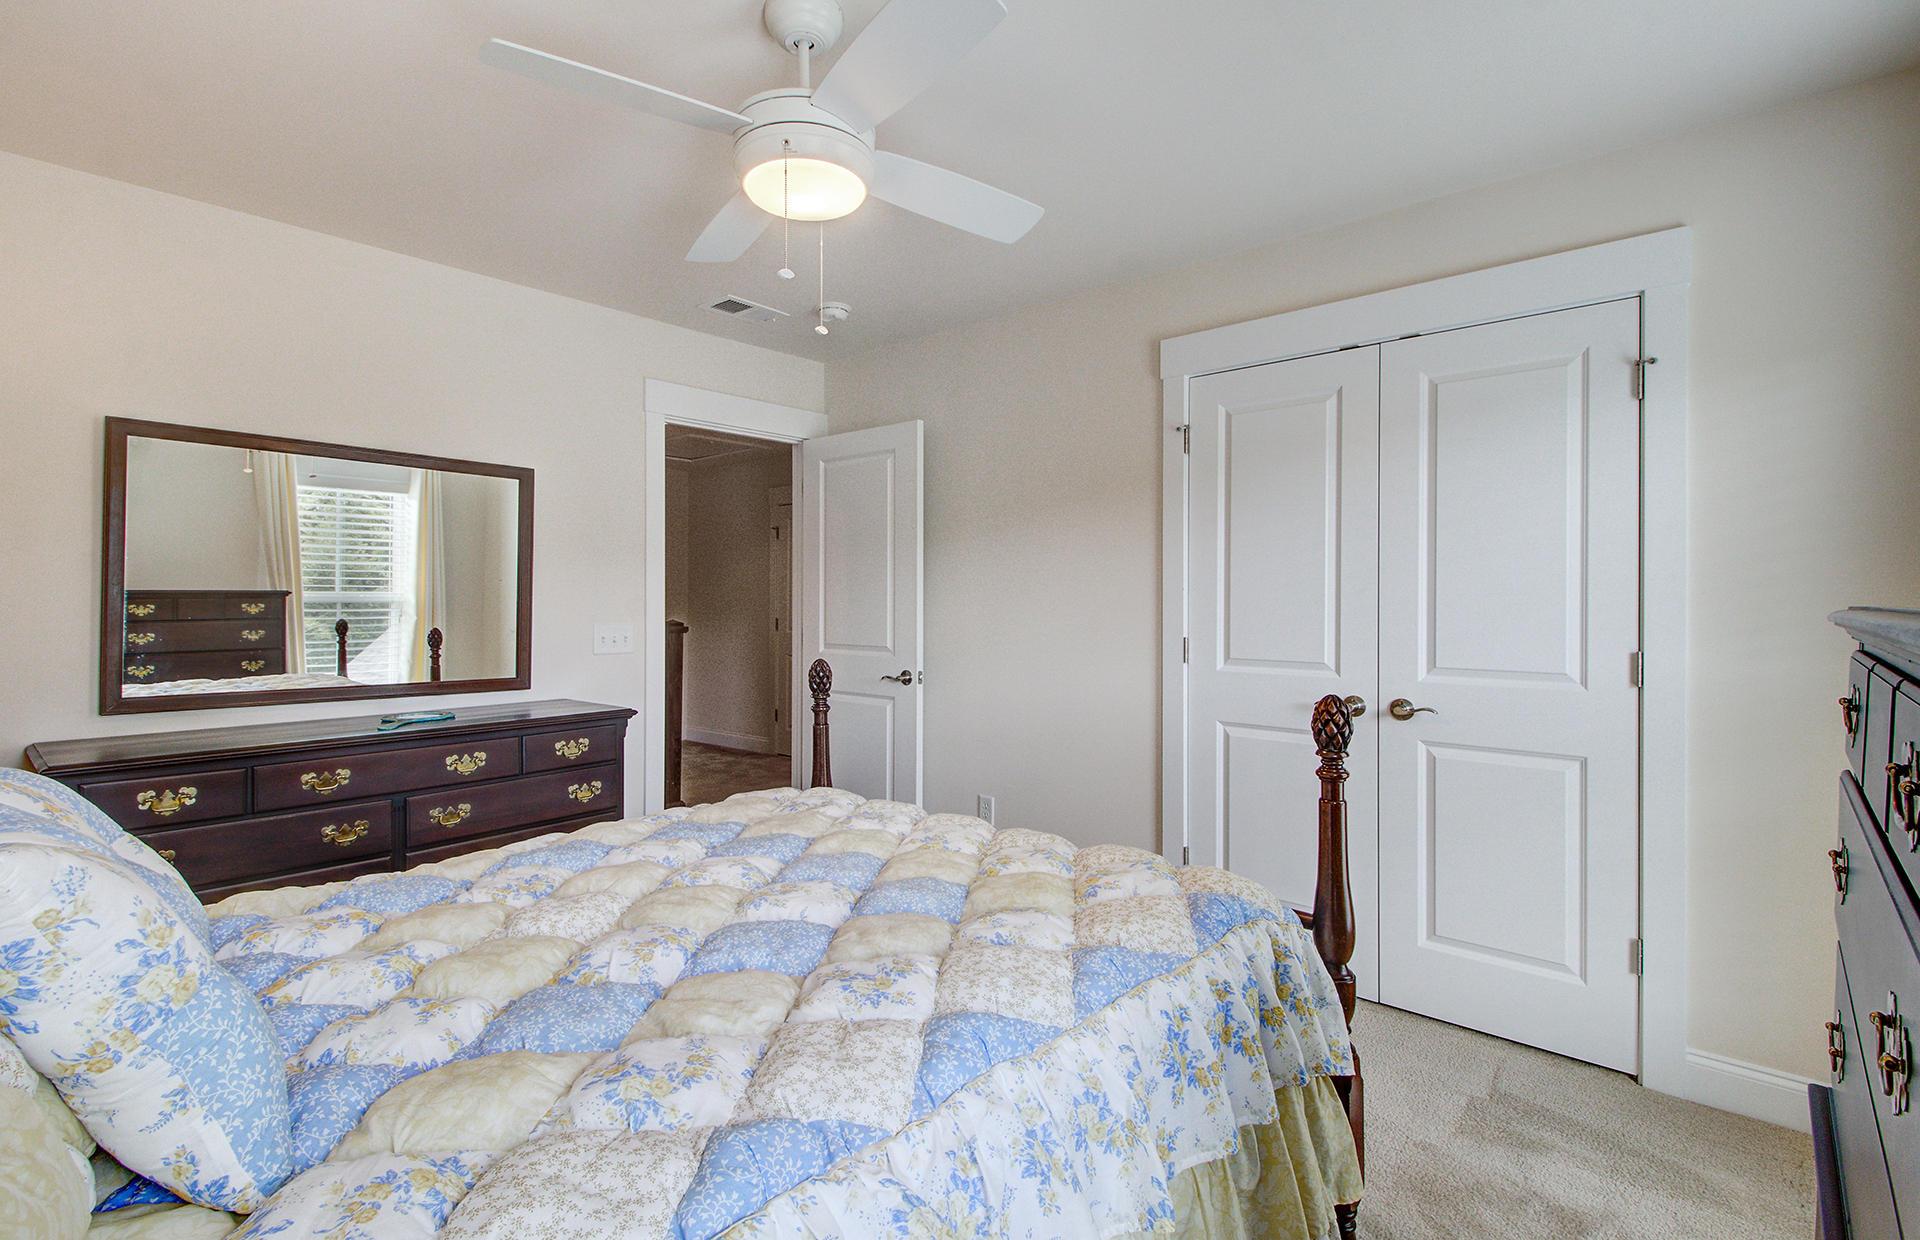 Scotts Creek Homes For Sale - 1404 Scotts Creek, Mount Pleasant, SC - 10